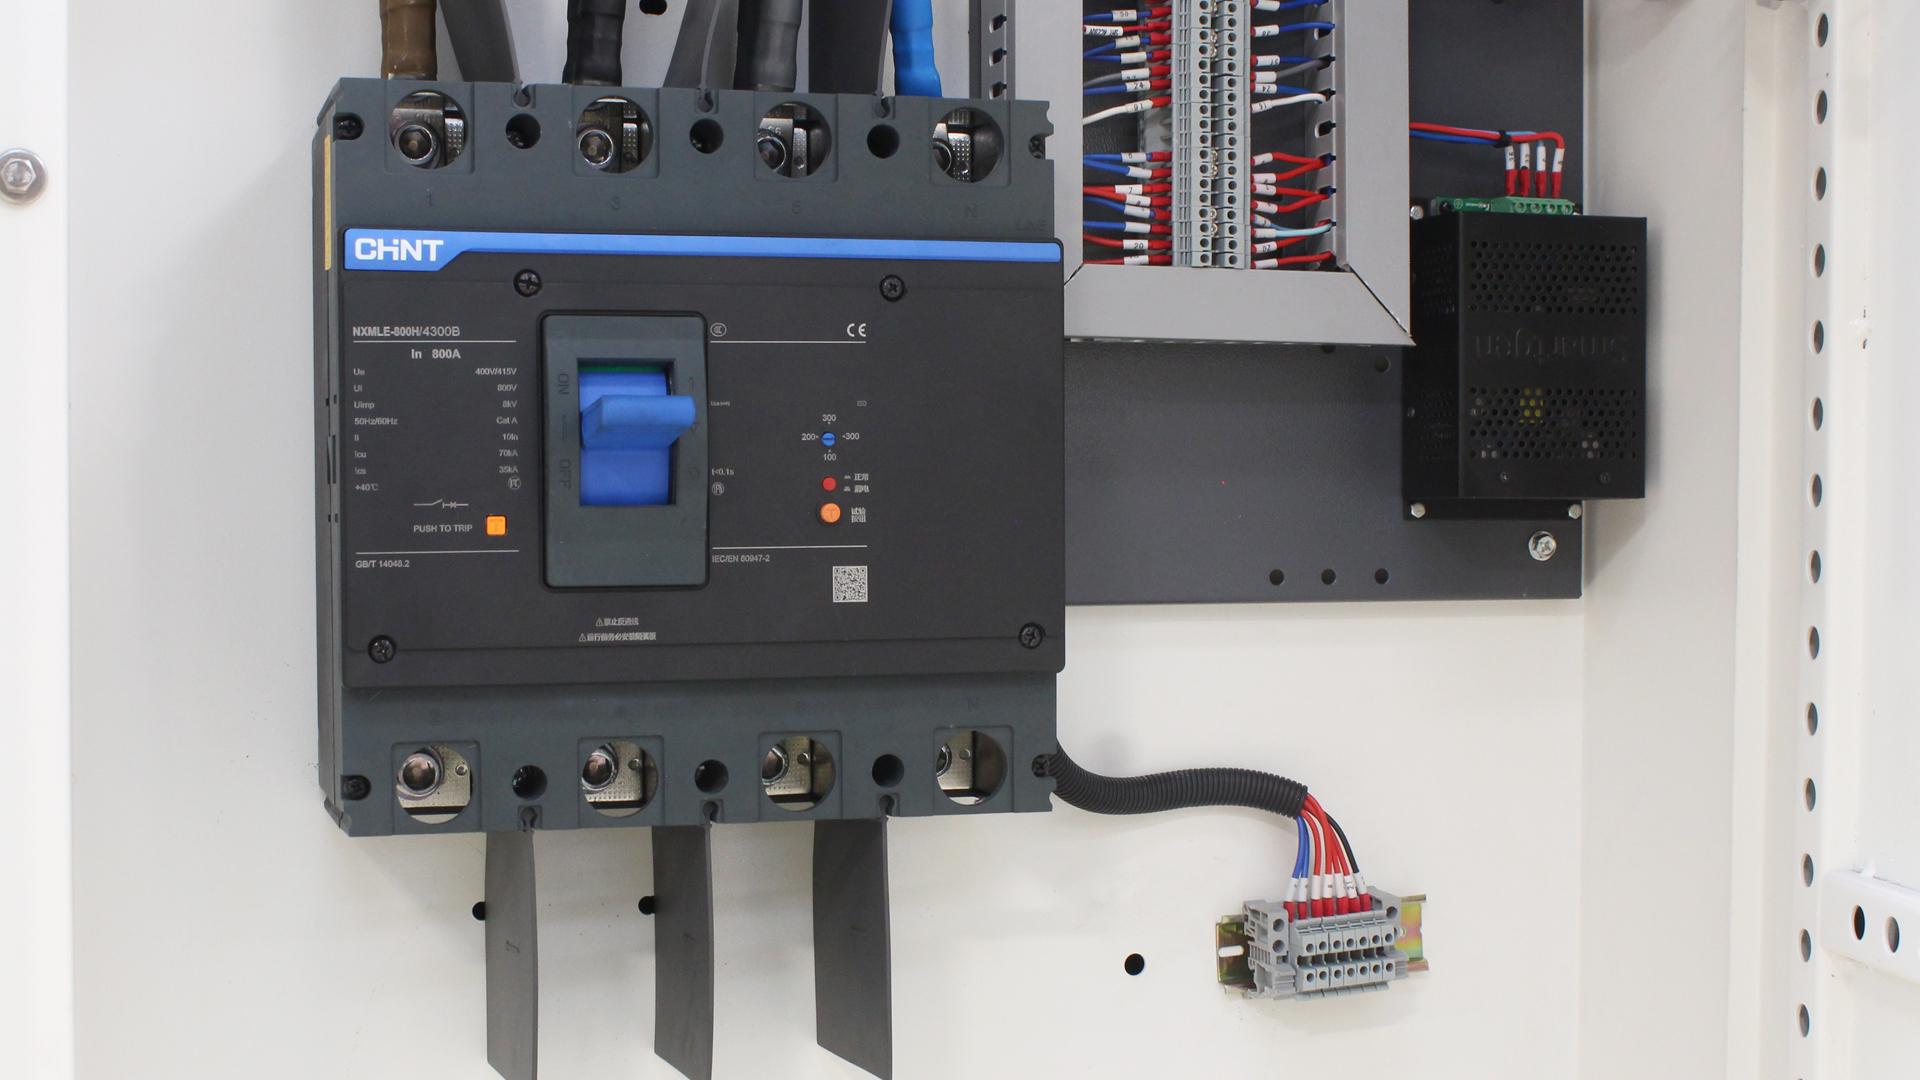 CHiNT breaker 3P+N three phase on UKC550ECO 550kVA genset